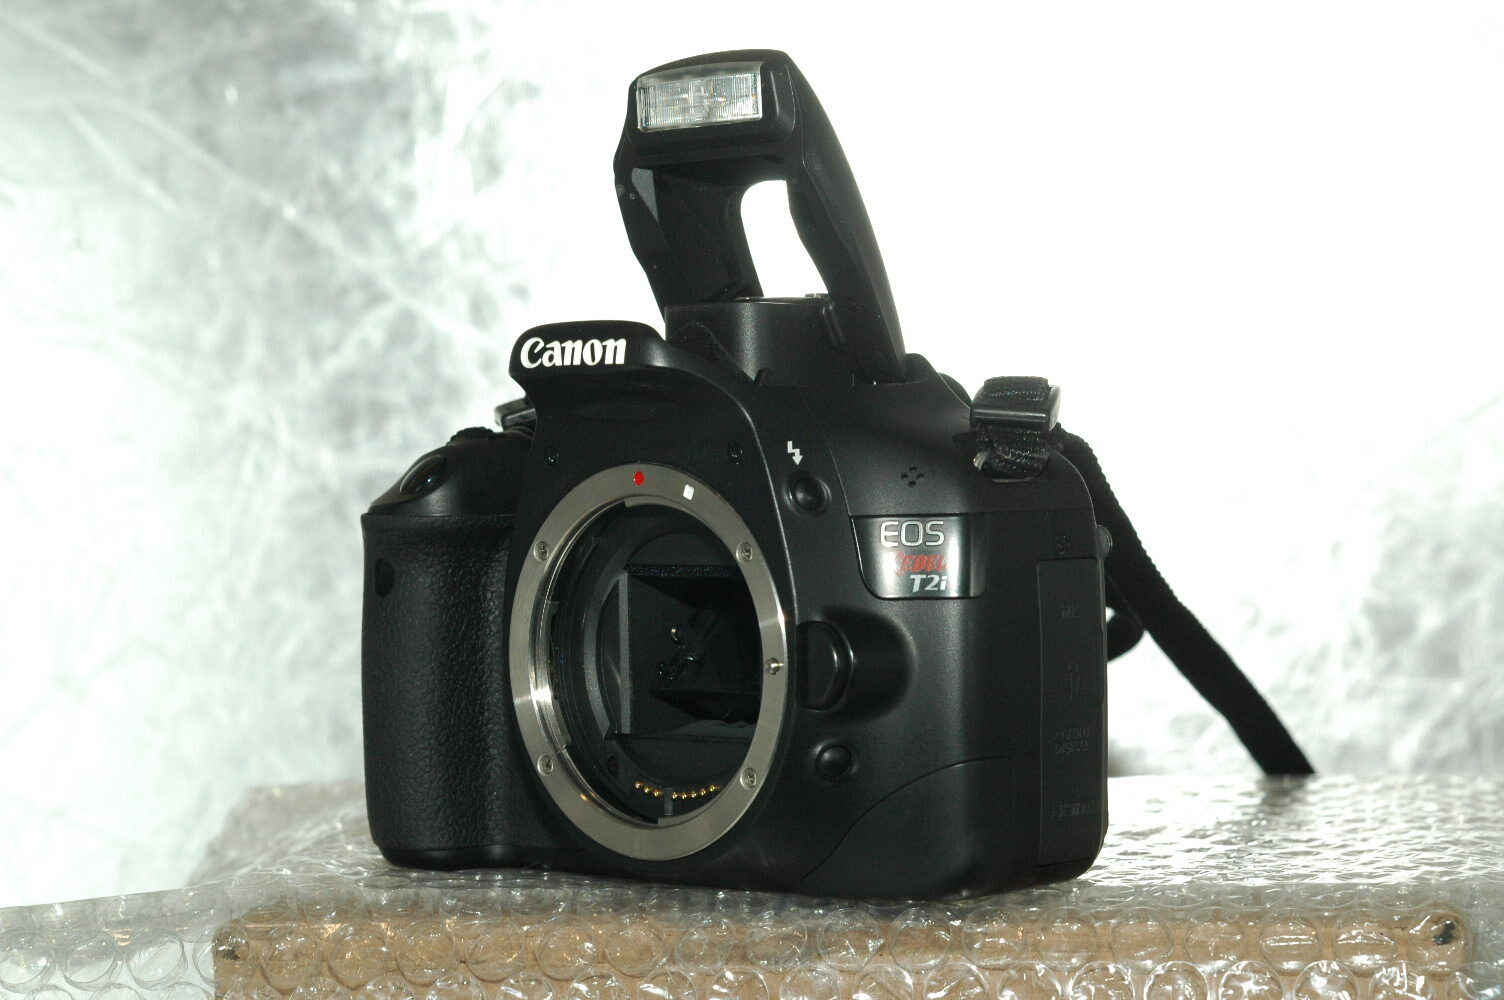 Canon EOS Rebel T2i 550D 18.0MP Digital SLR Camera Body Lowepro- Mini Camera Bag - $138.50